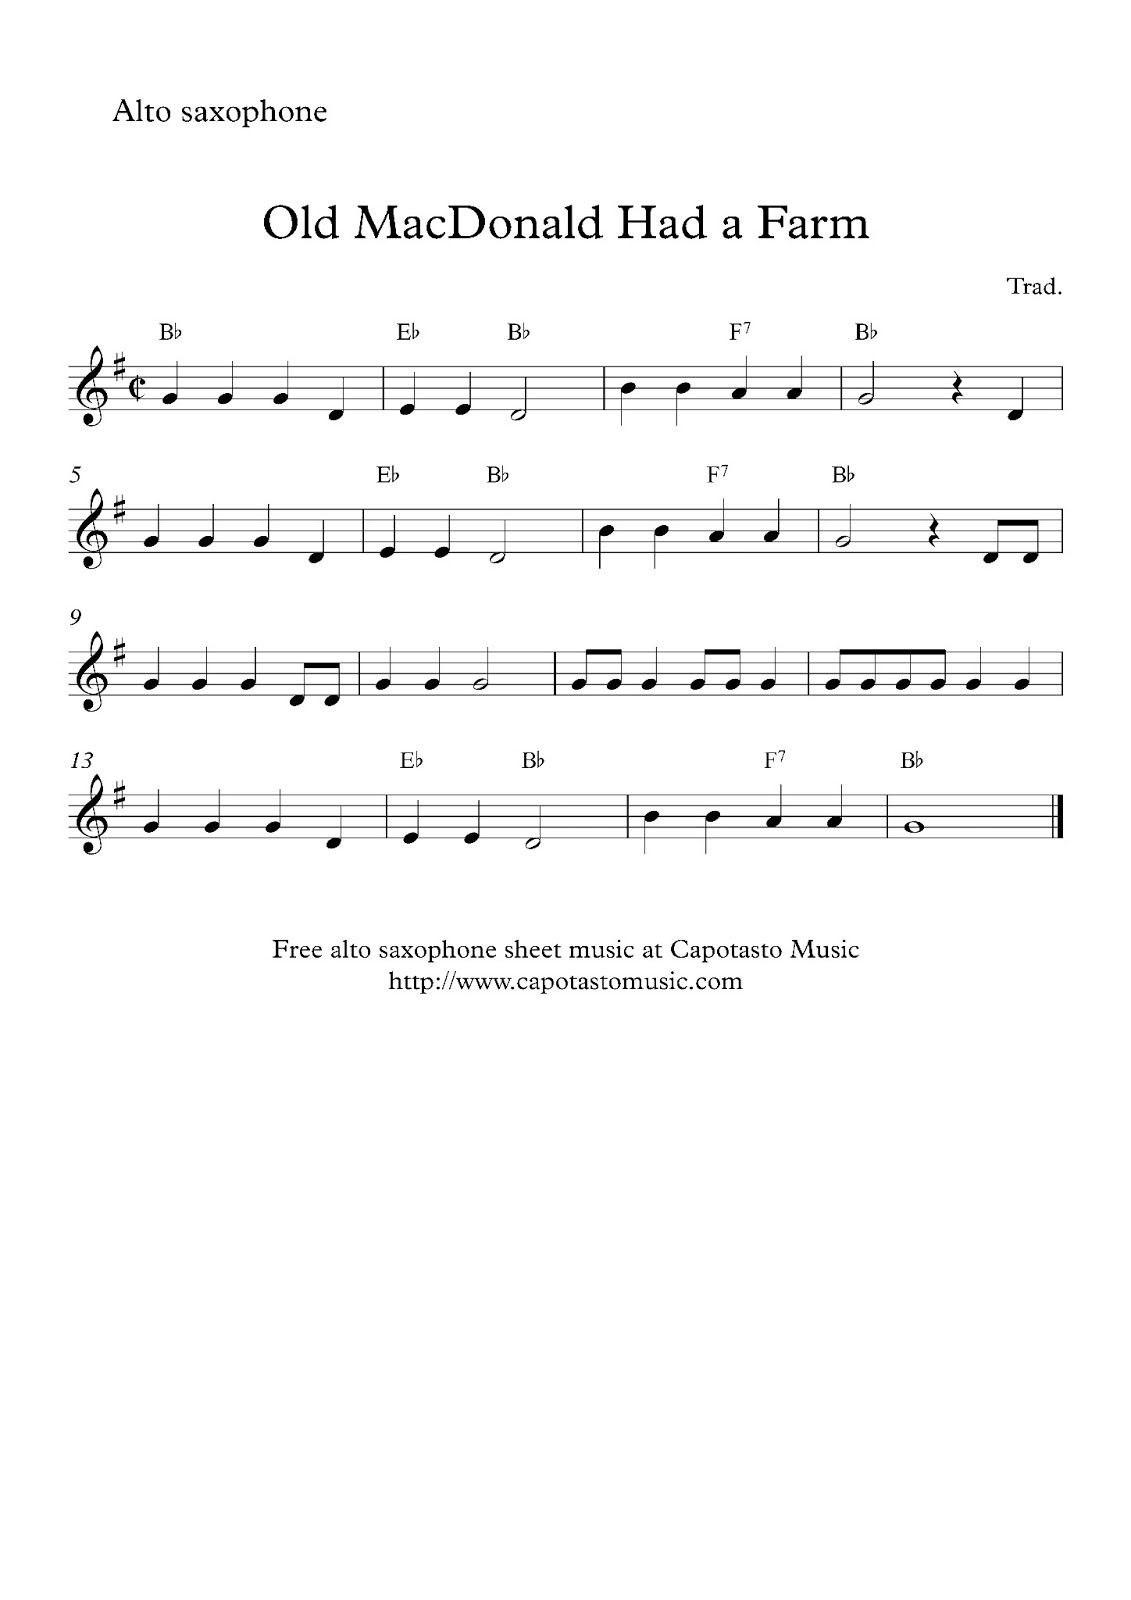 Alto Sax Easy Songs Free Sheet Music Scores Free easy